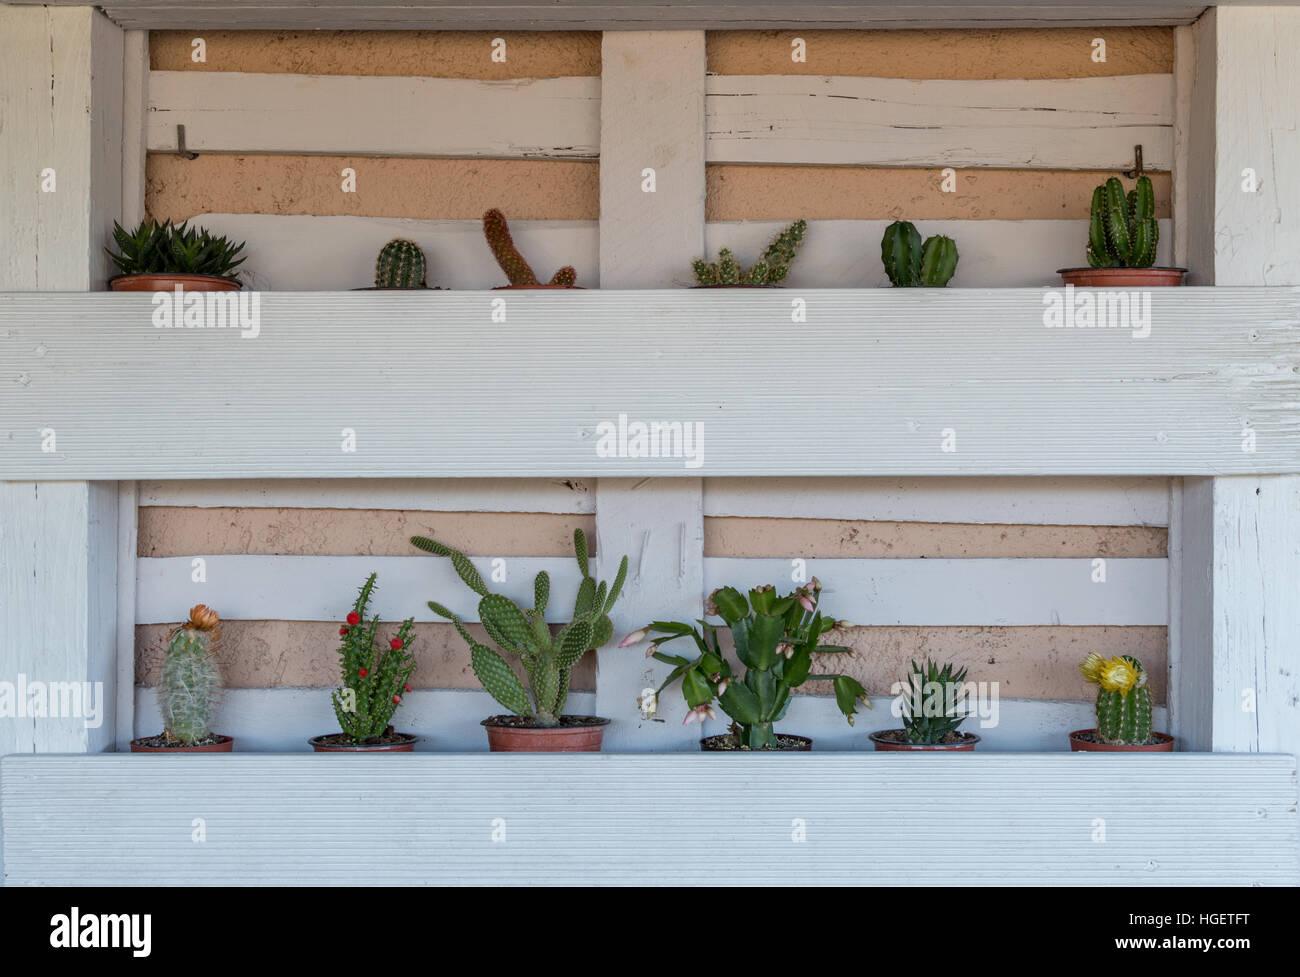 Garden idea with a pallet - Stock Image